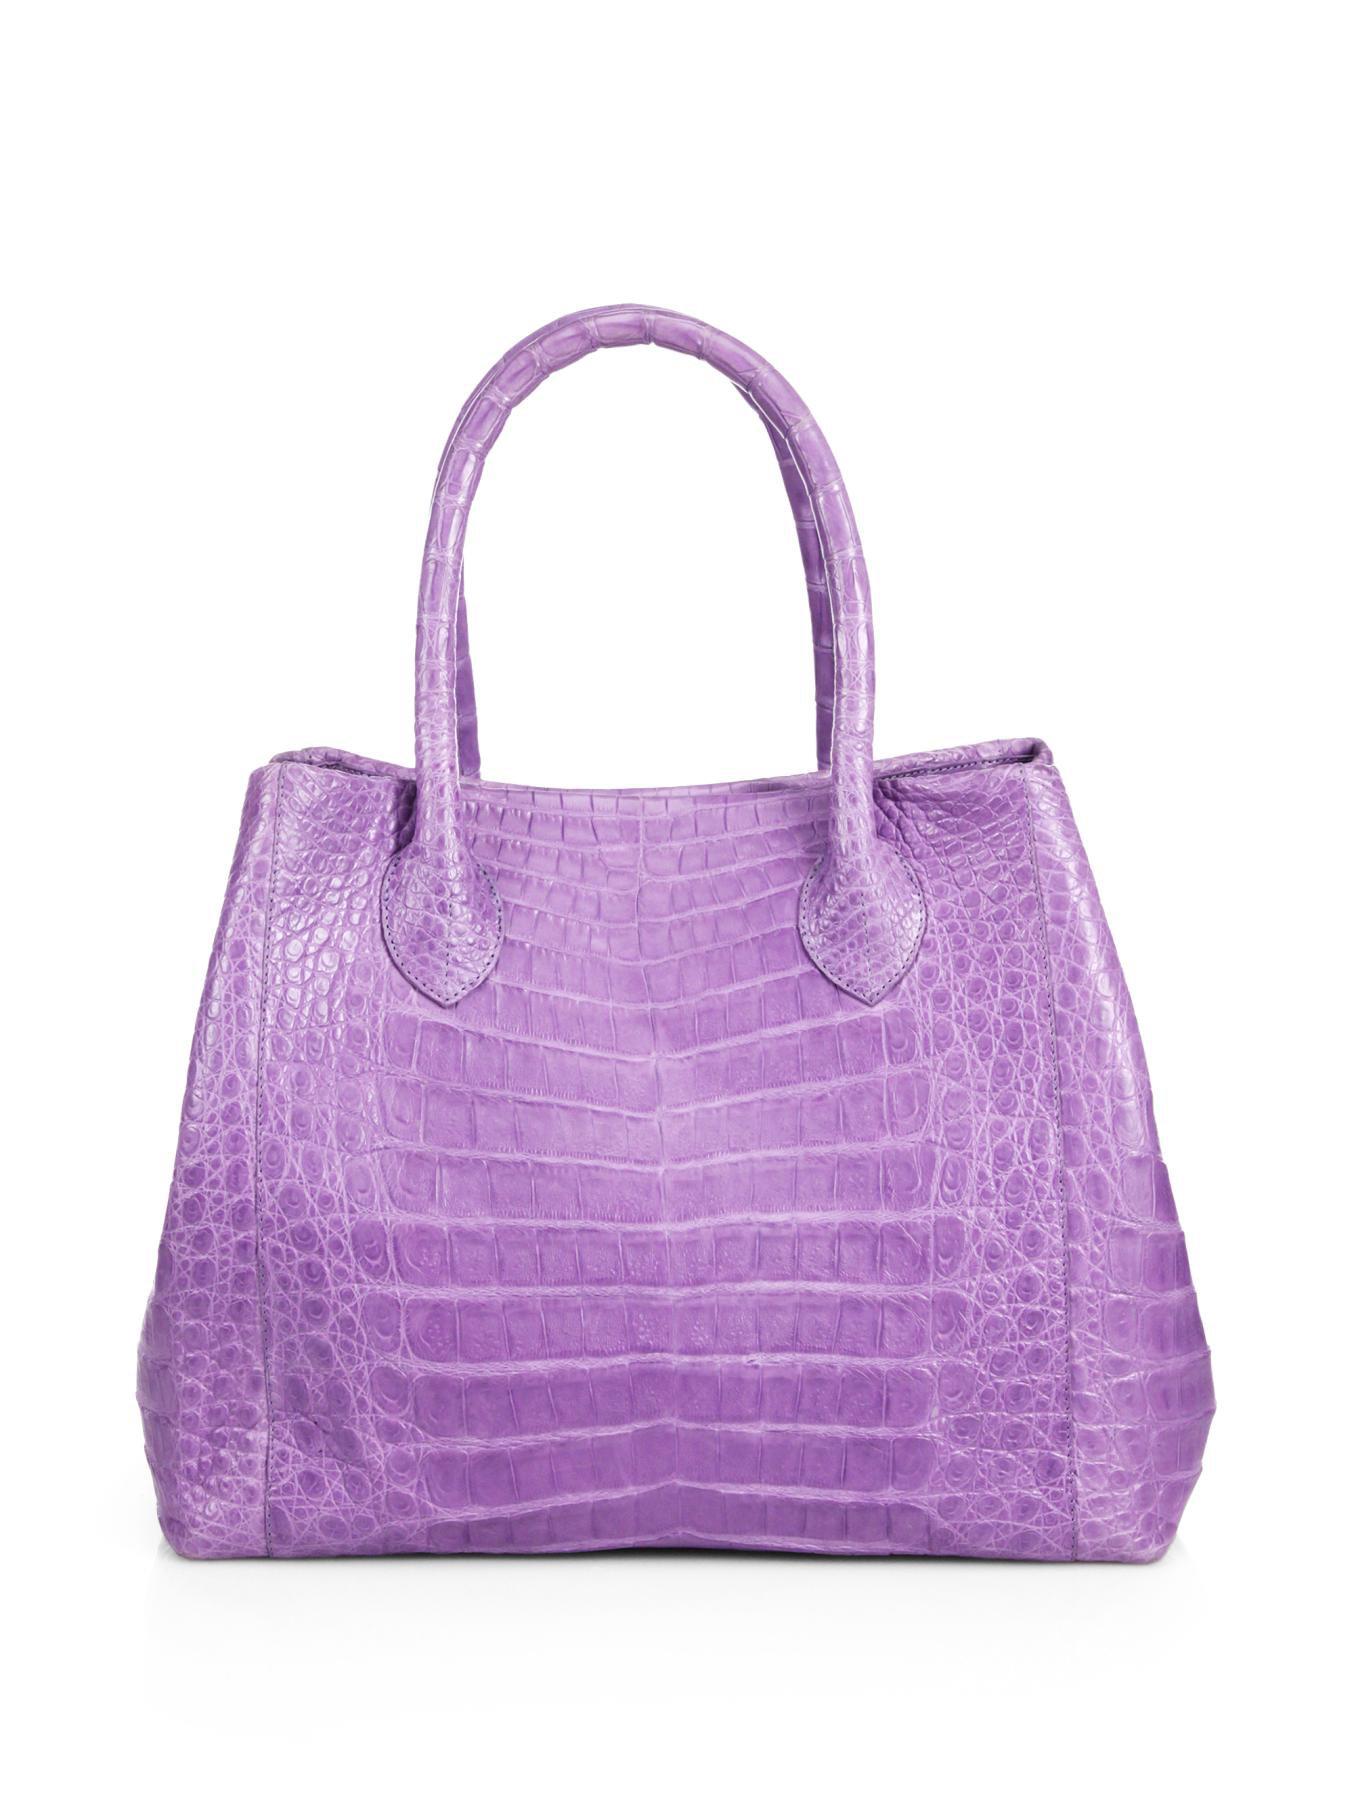 Nancy gonzalez small crocodile expandable tote in purple for Nancy gonzalez crocodile tote